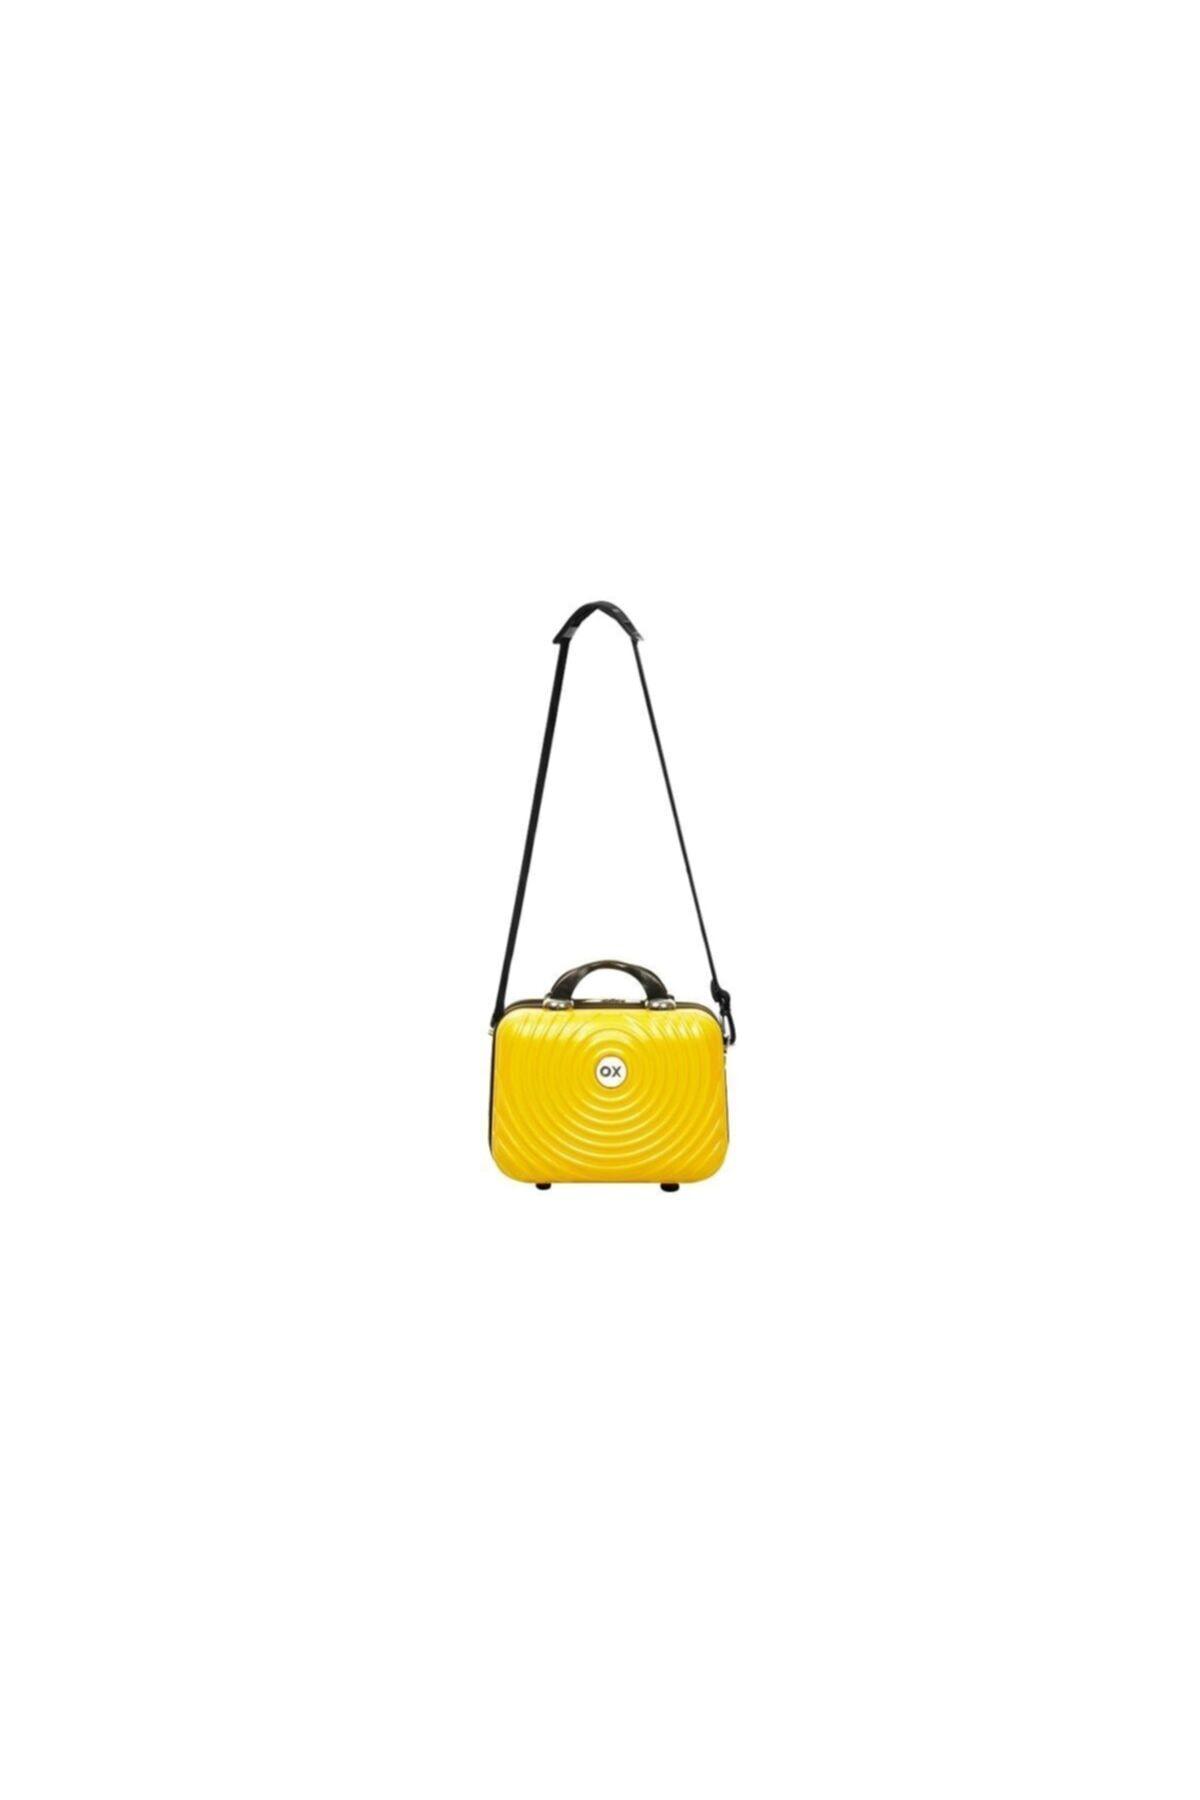 خرید نقدی کیف لوازم آرایش جدید برند OX رنگ زرد ty45980111